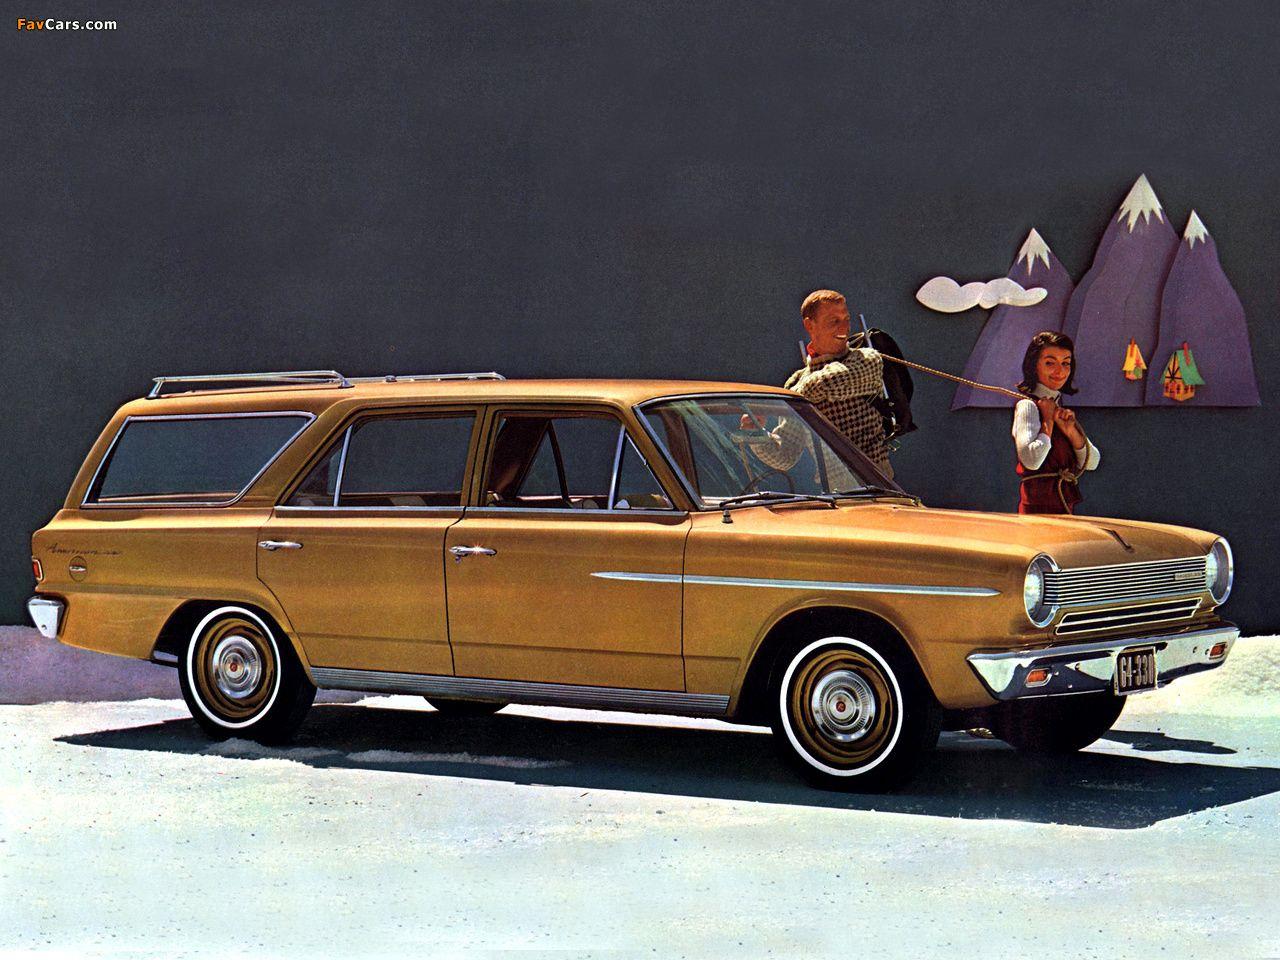 1964 rambler american 330 wagon meet me at the station. Black Bedroom Furniture Sets. Home Design Ideas